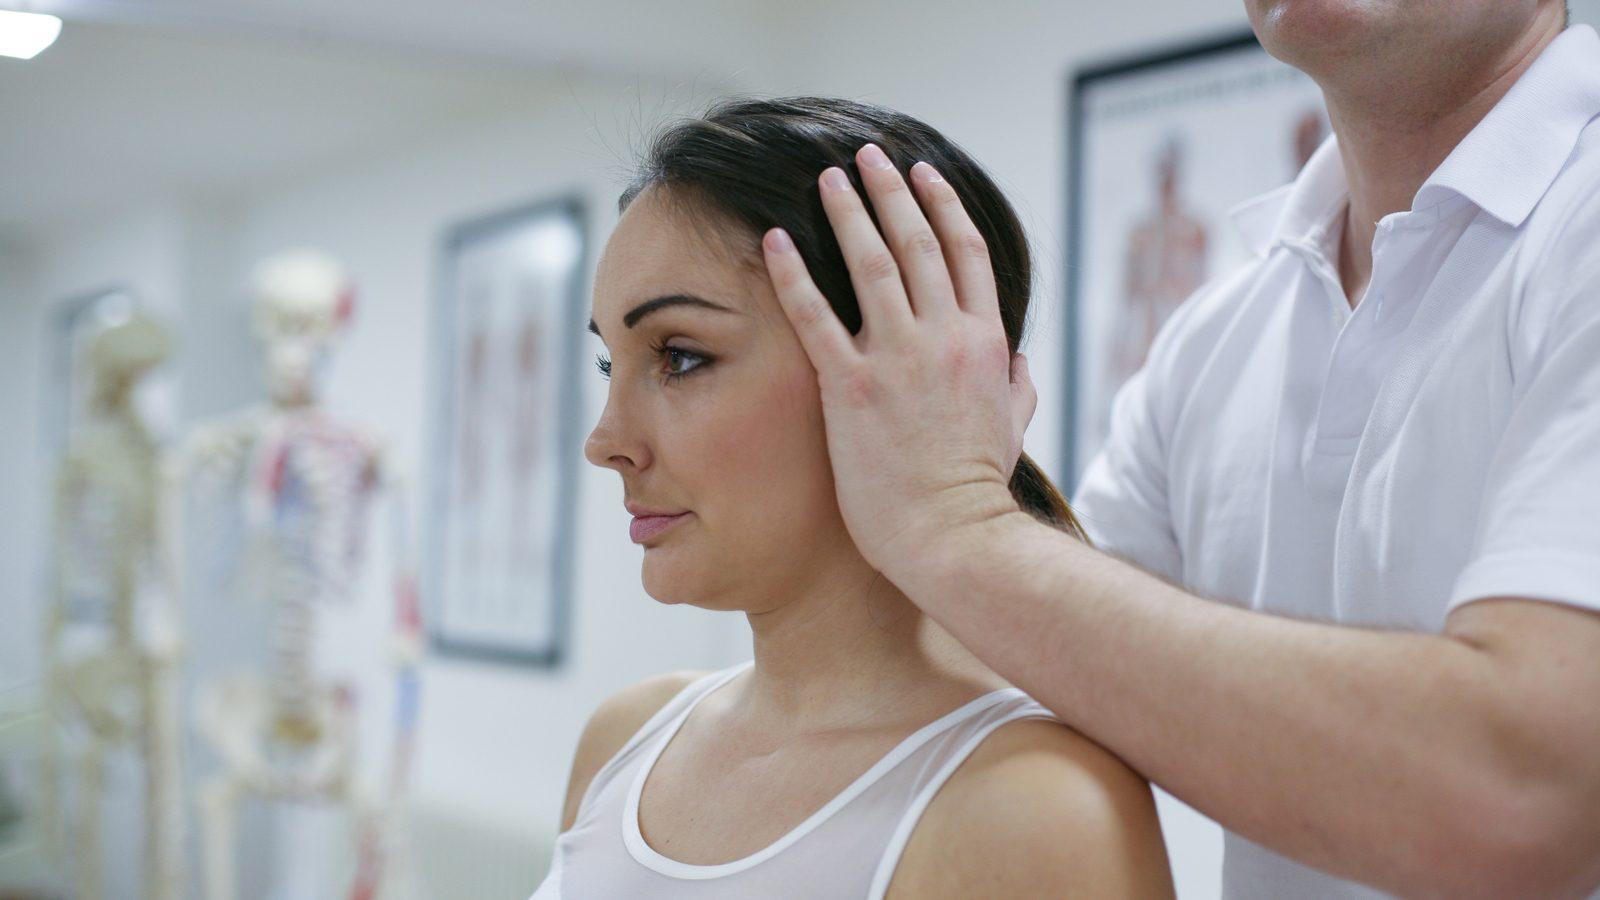 Vestibular Assessment : Confidently evaluate patients who have vertigo using evidence-based techniques